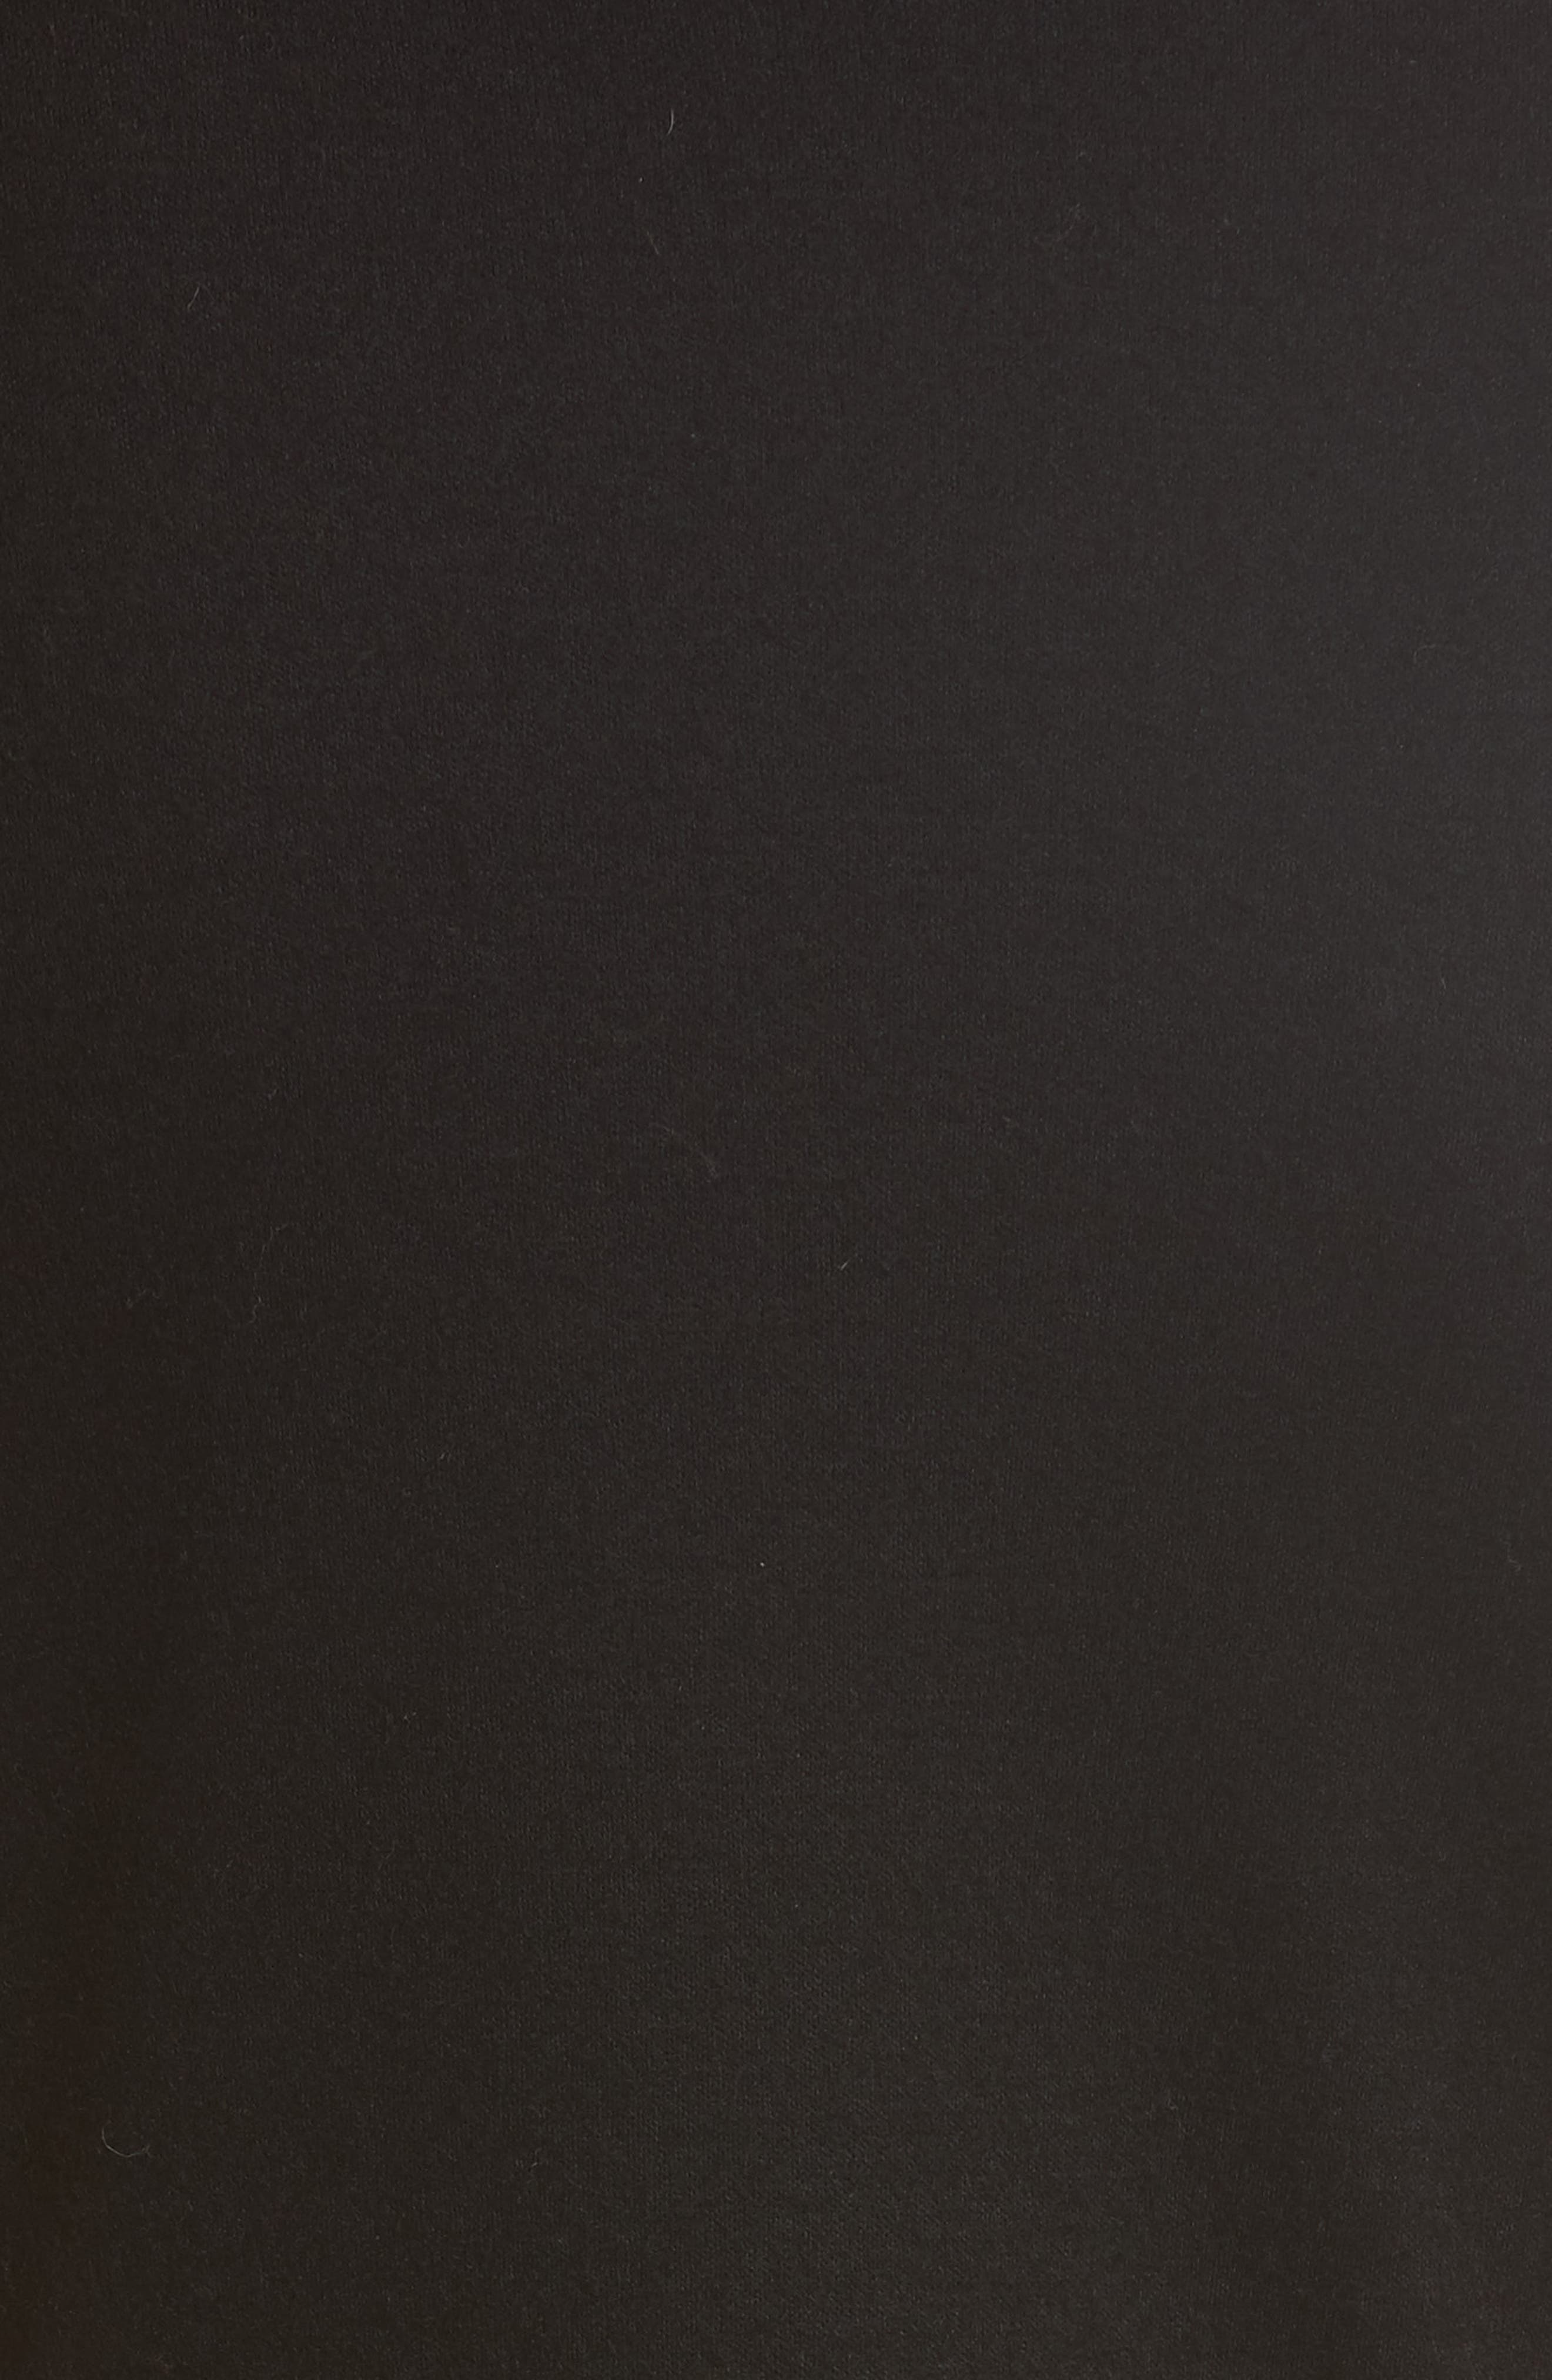 Cutout Wool Blend Dress,                             Alternate thumbnail 5, color,                             Black